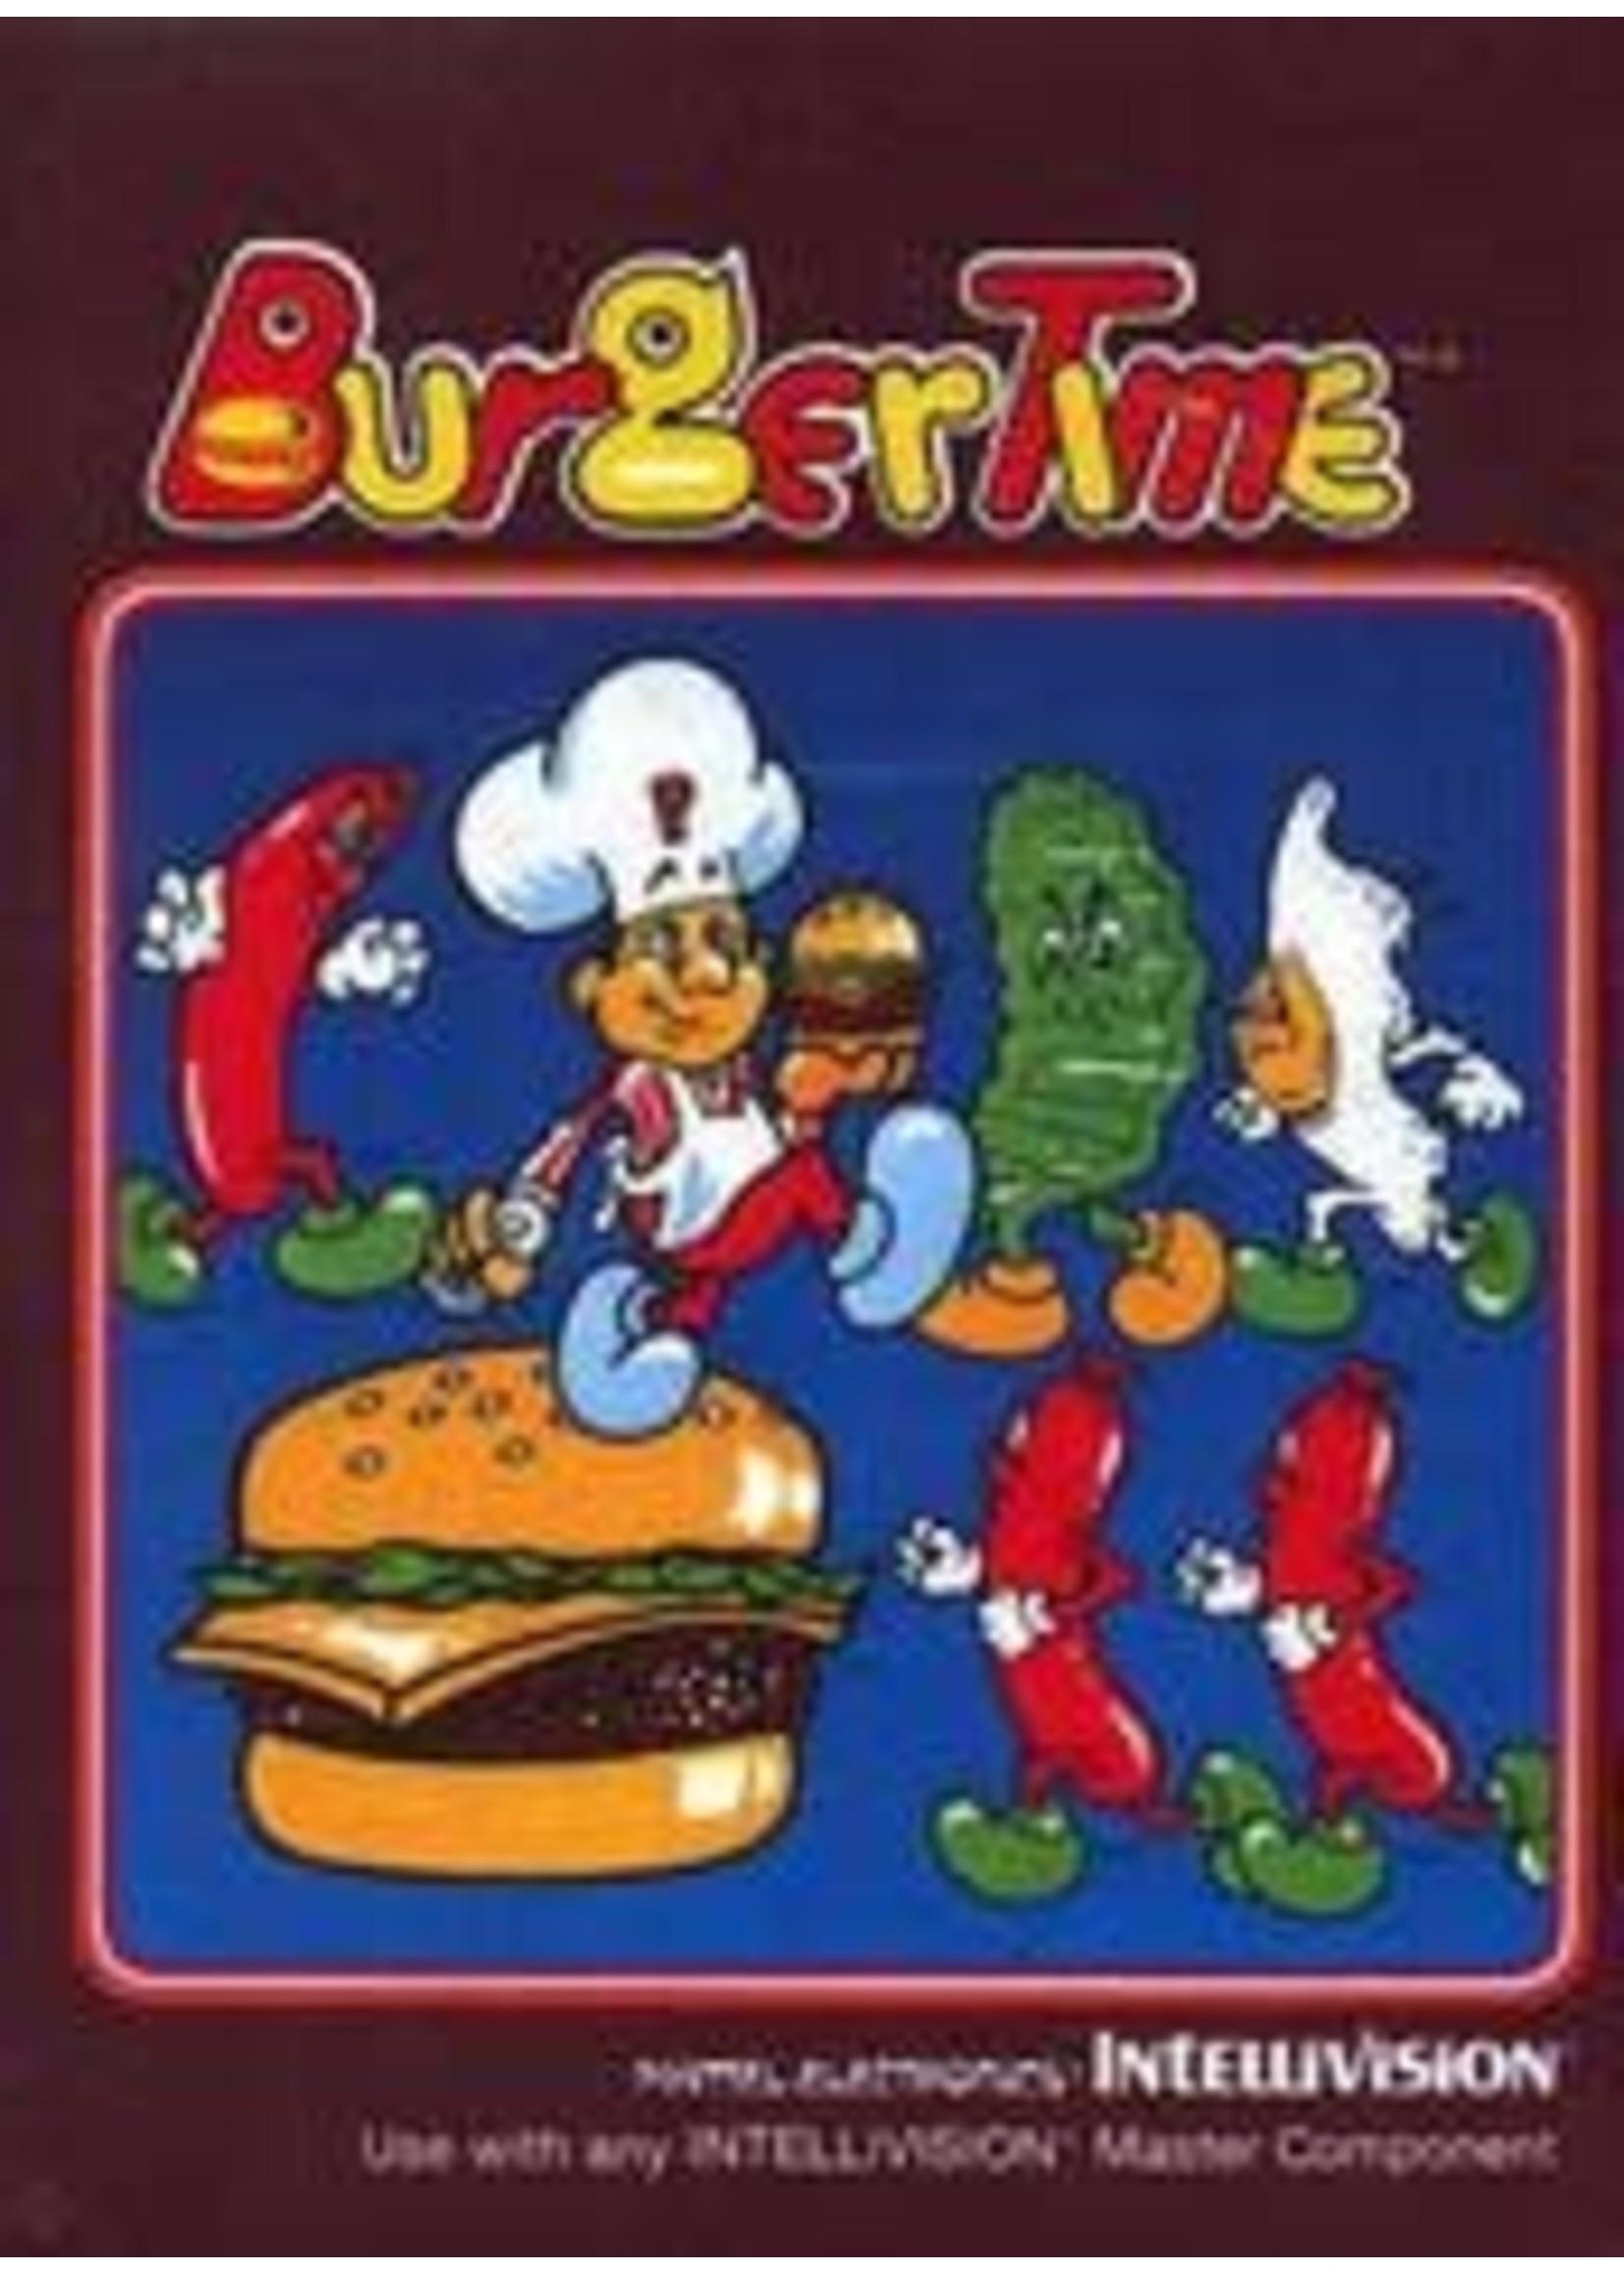 Burgertime Intellivision